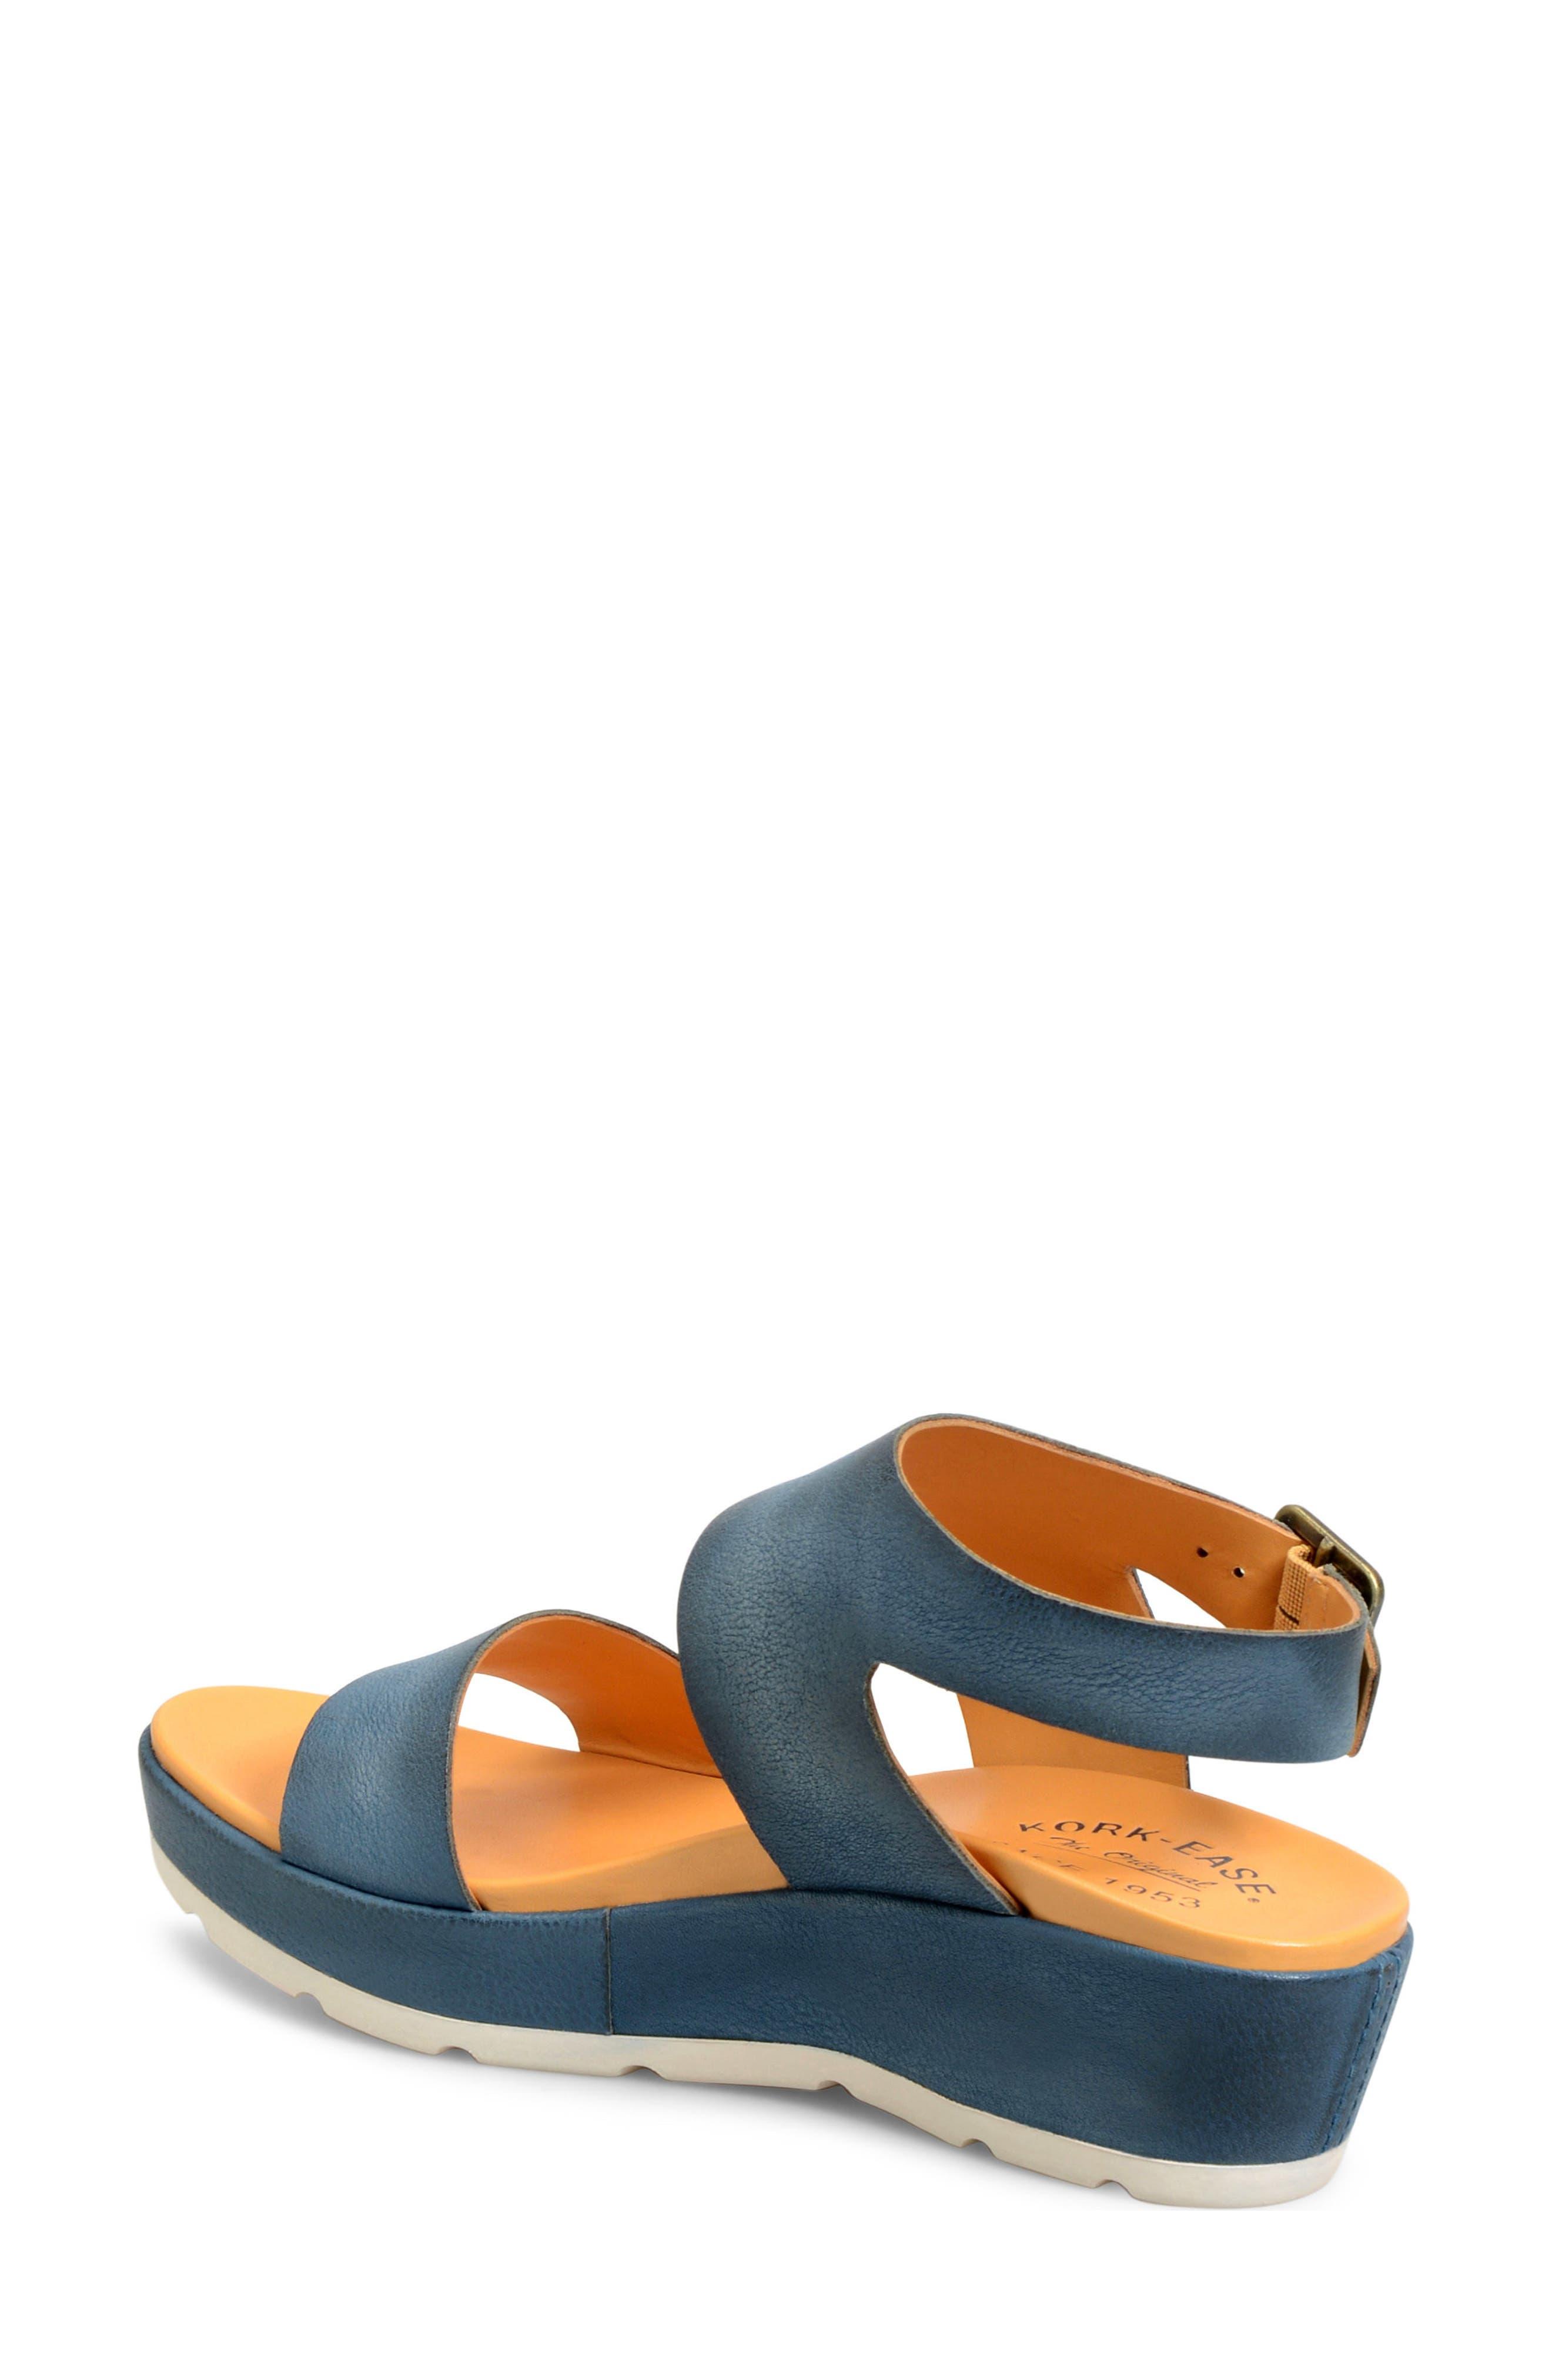 'Khloe' Platform Wedge Sandal,                             Alternate thumbnail 10, color,